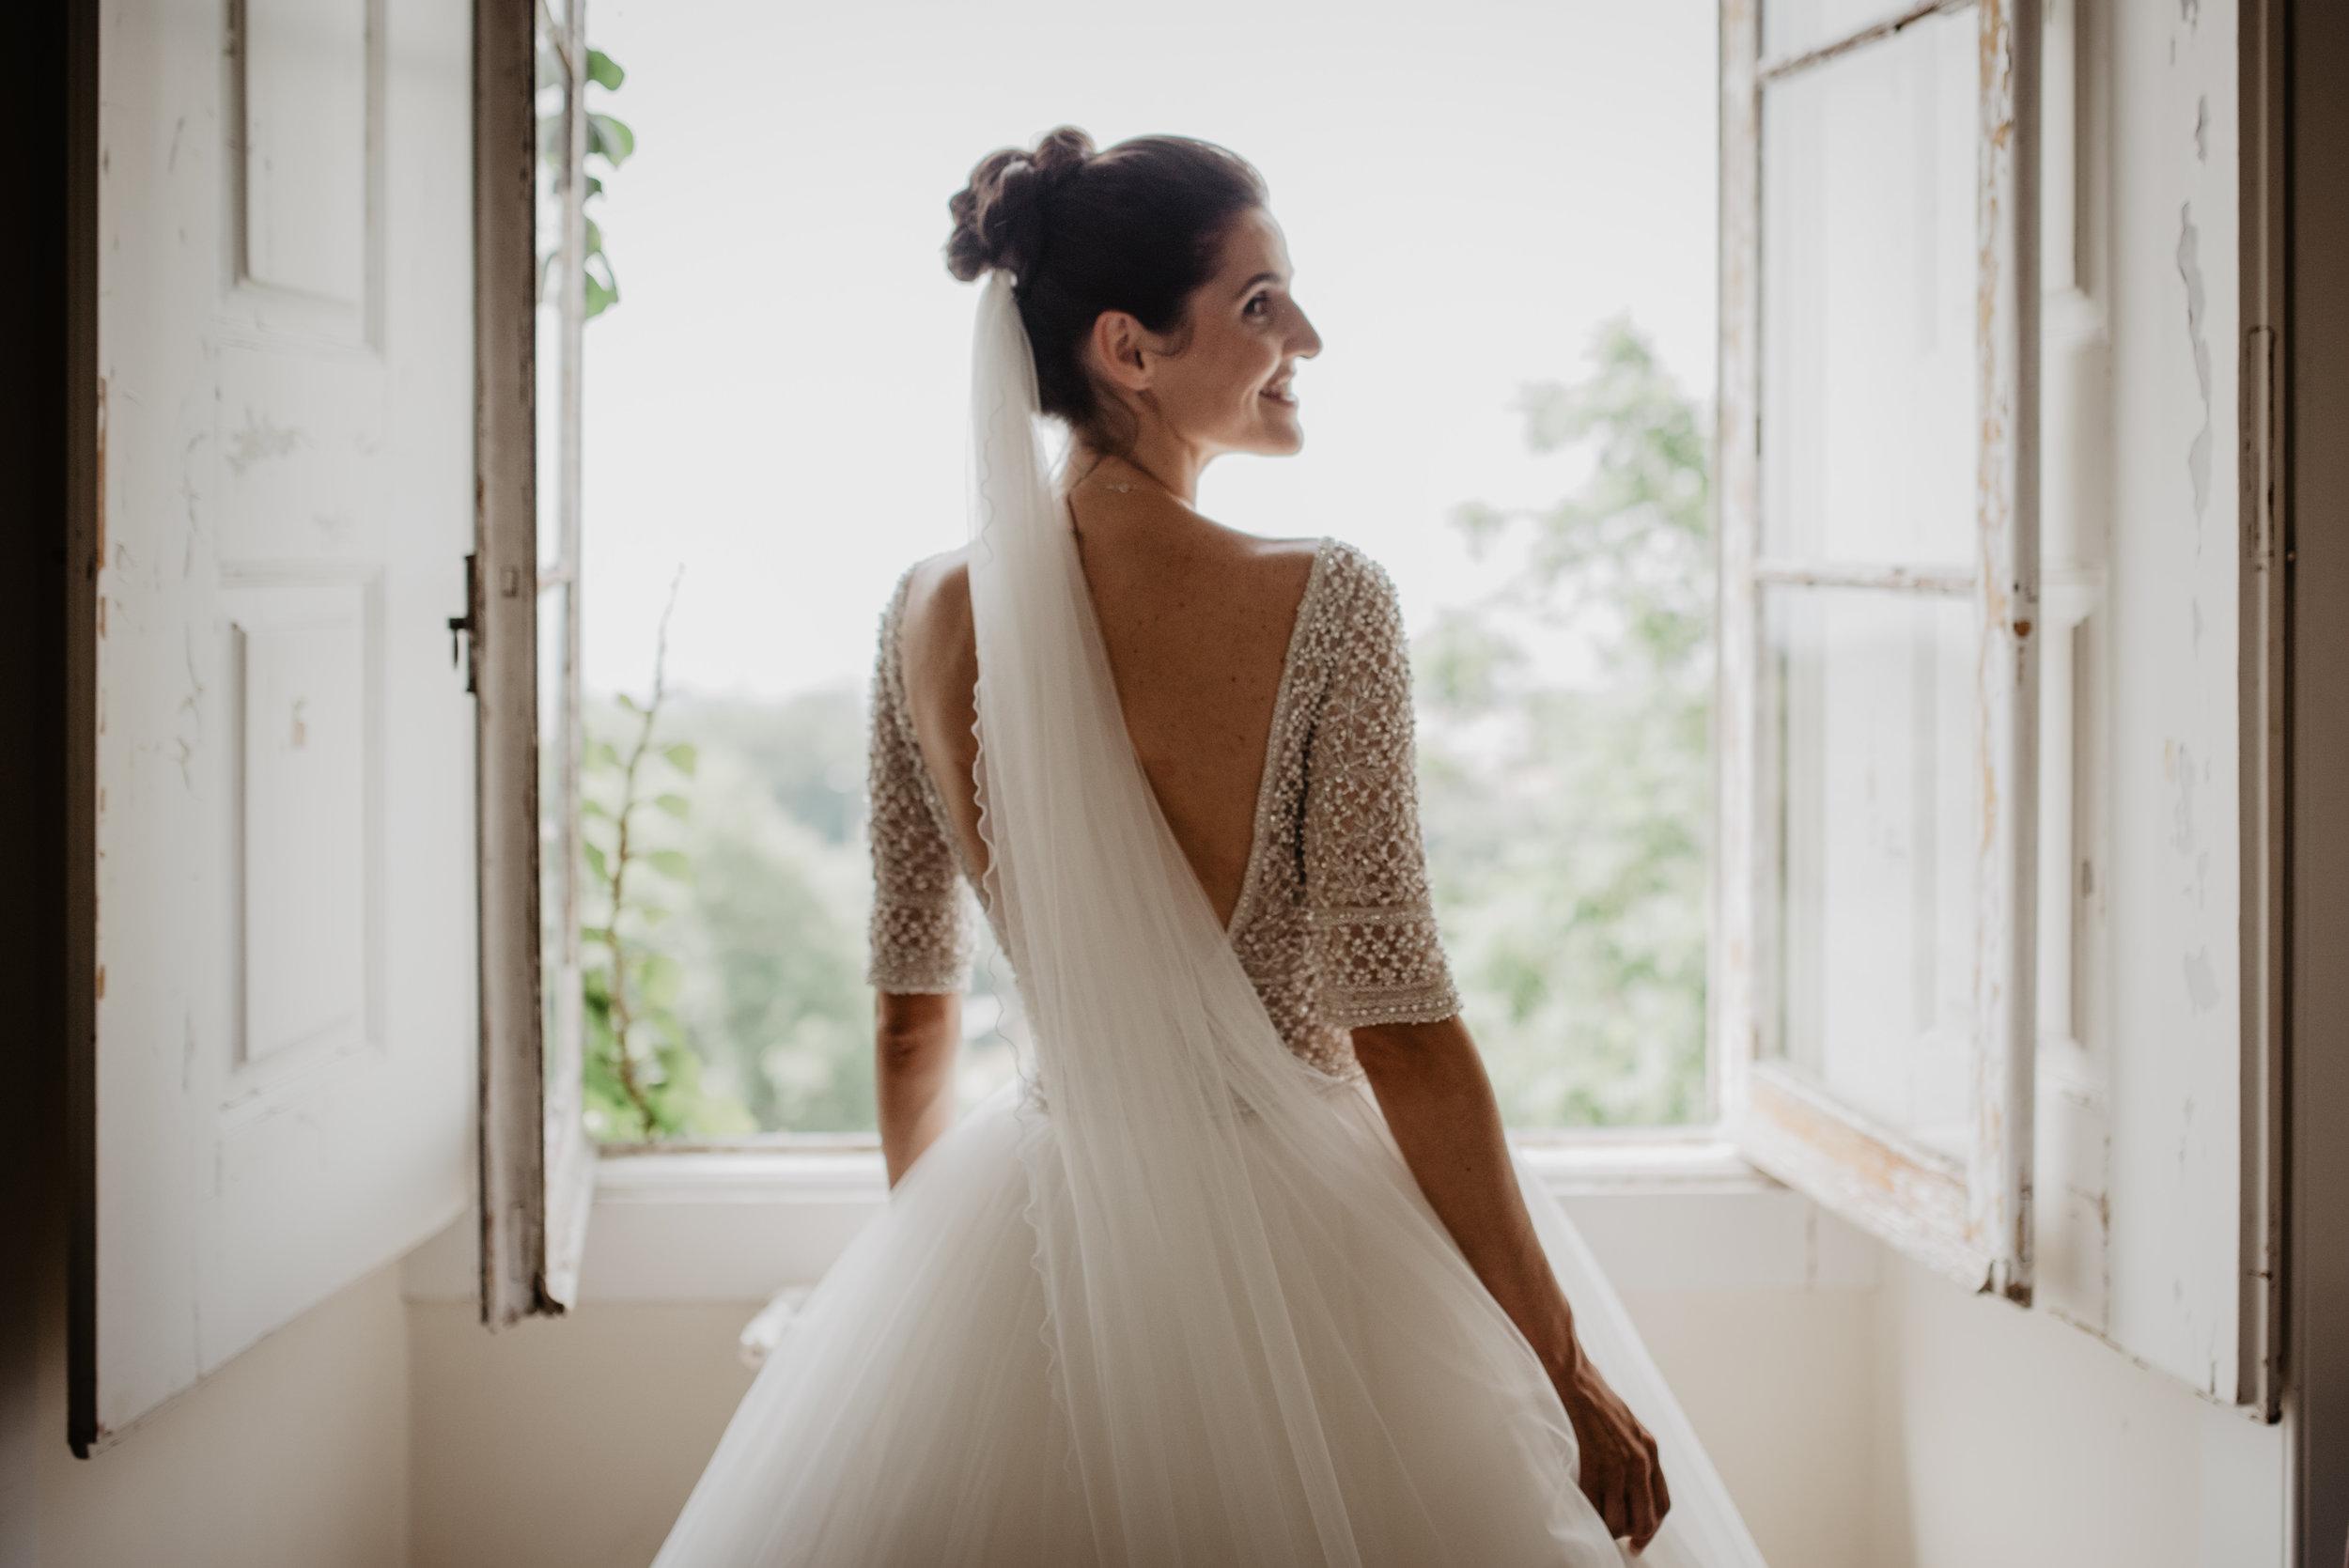 Lapela-photography-wedding-sintra-portugal-47.jpg